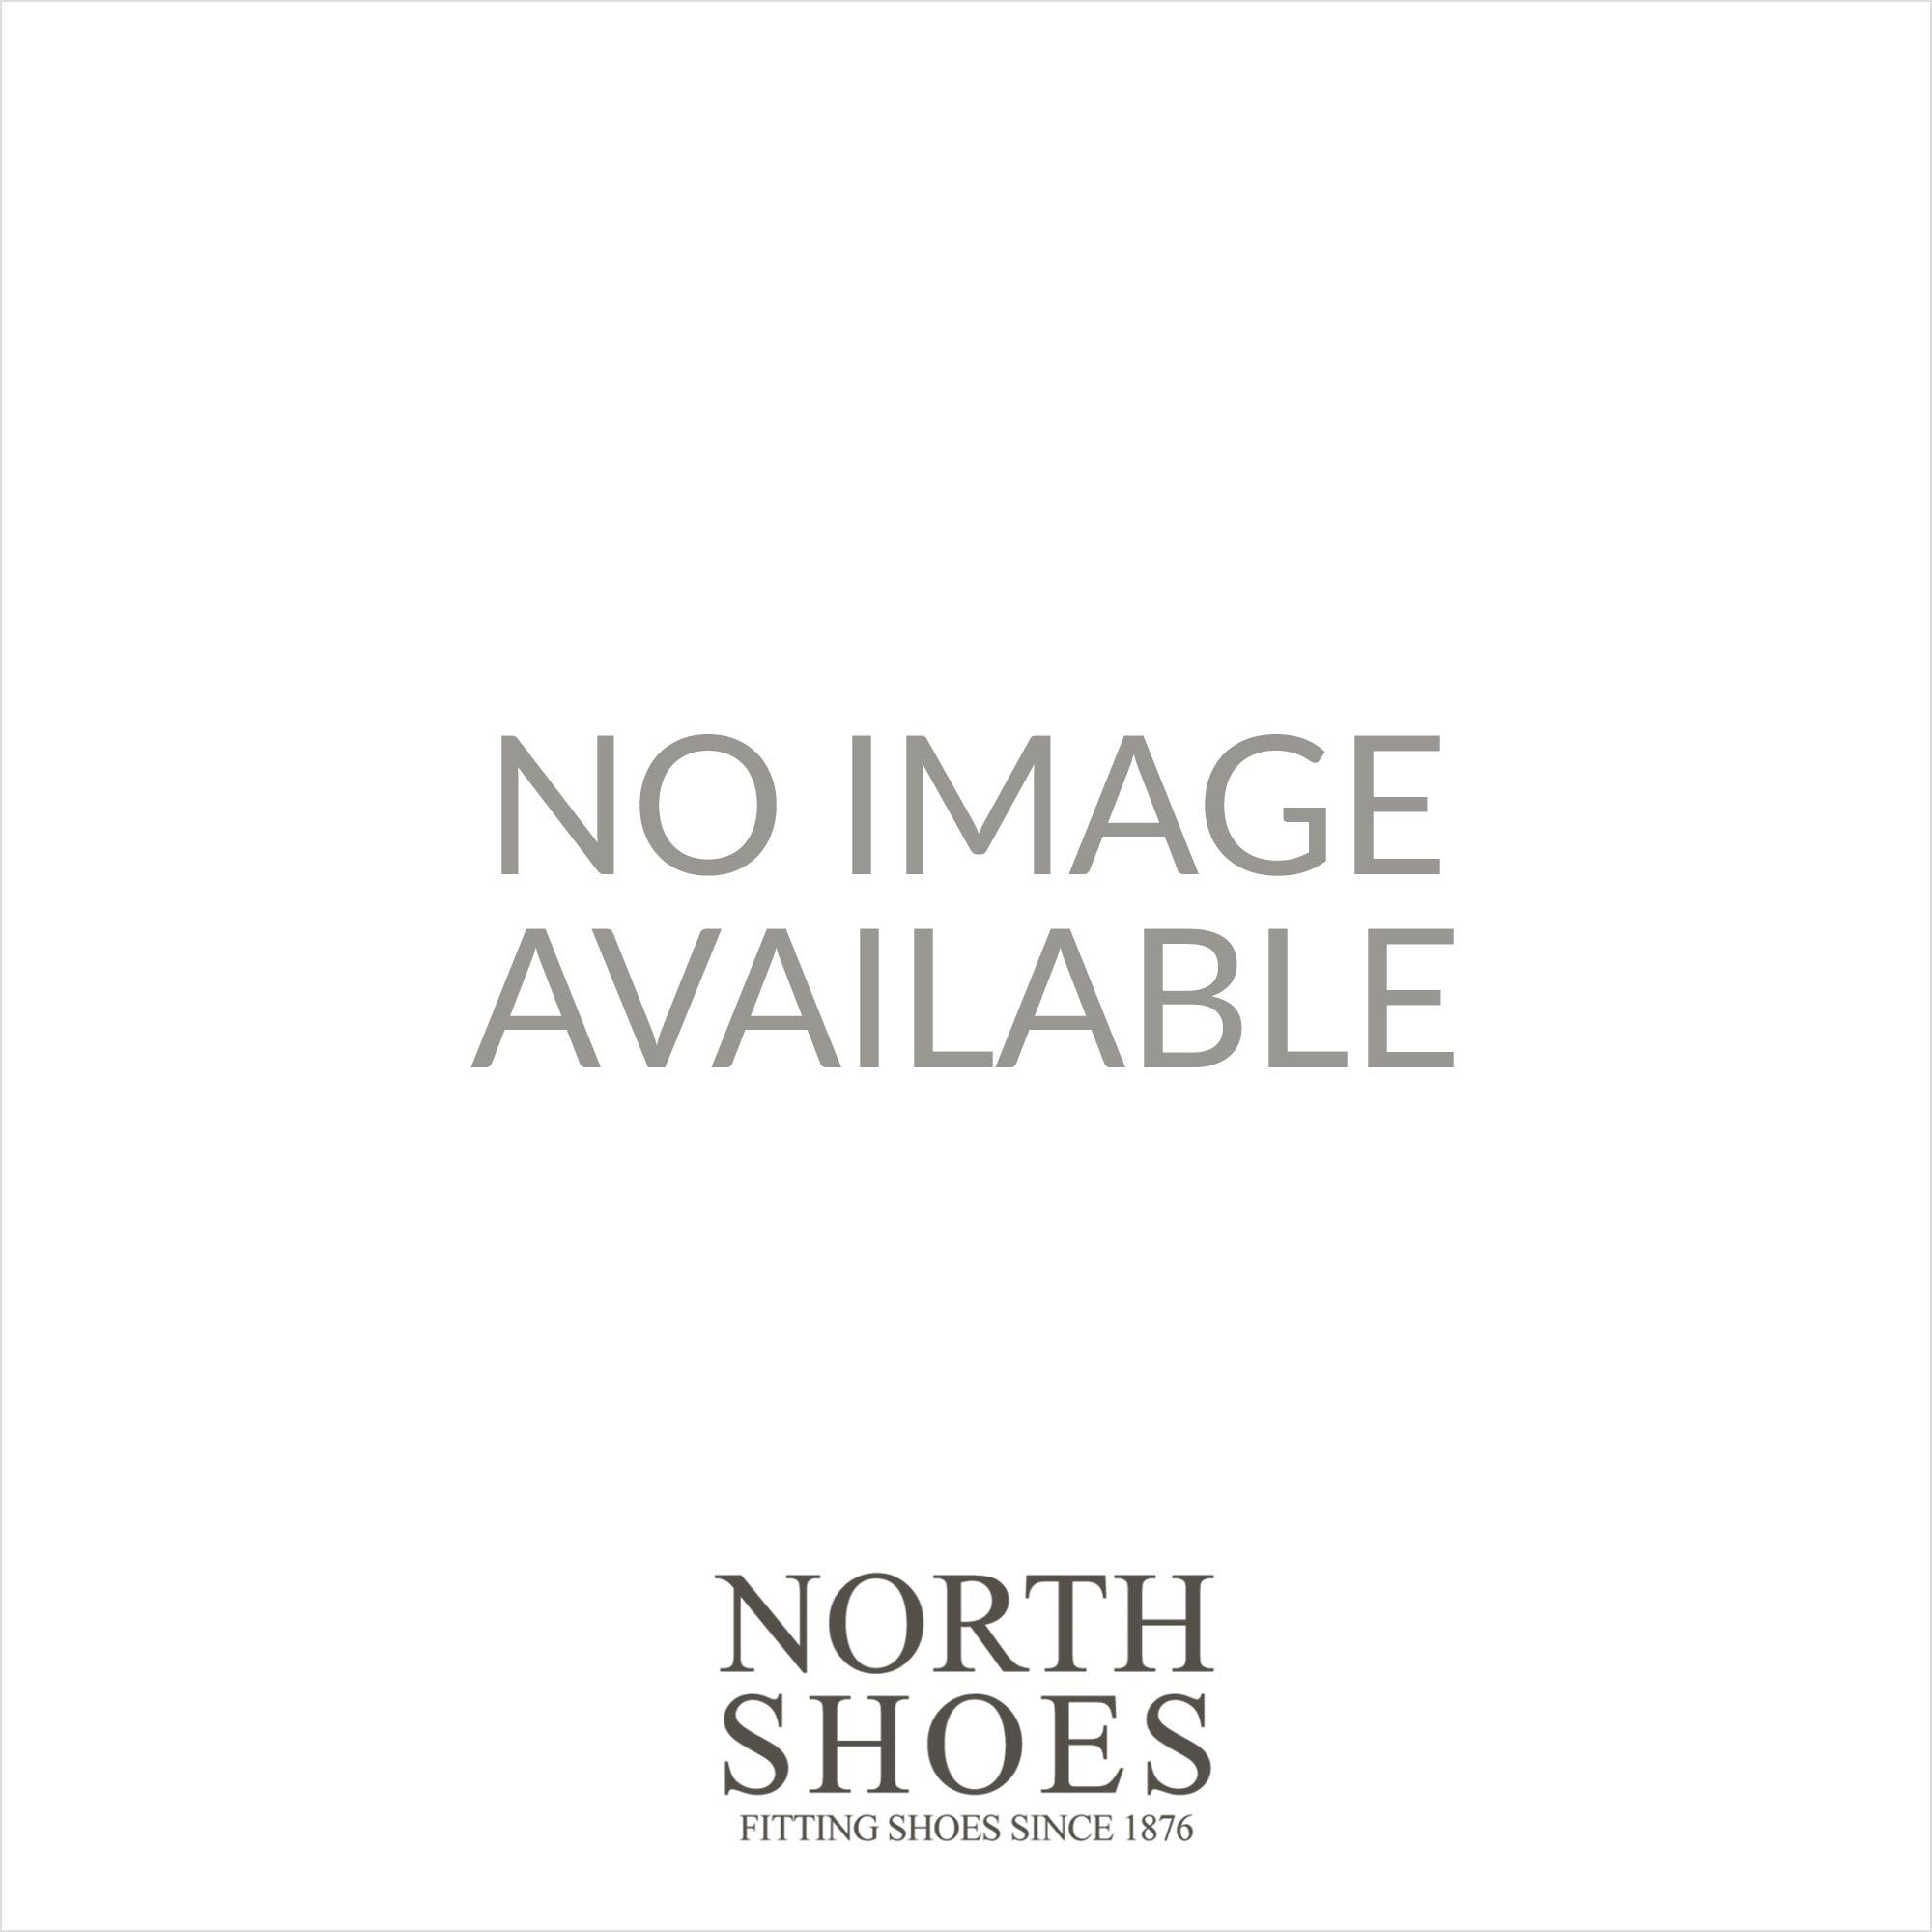 83e890ba666a Ecco Peekaboo 751891 50291 White Peach Leather Girls Closed Back Sandal -  Ecco from North Shoes UK